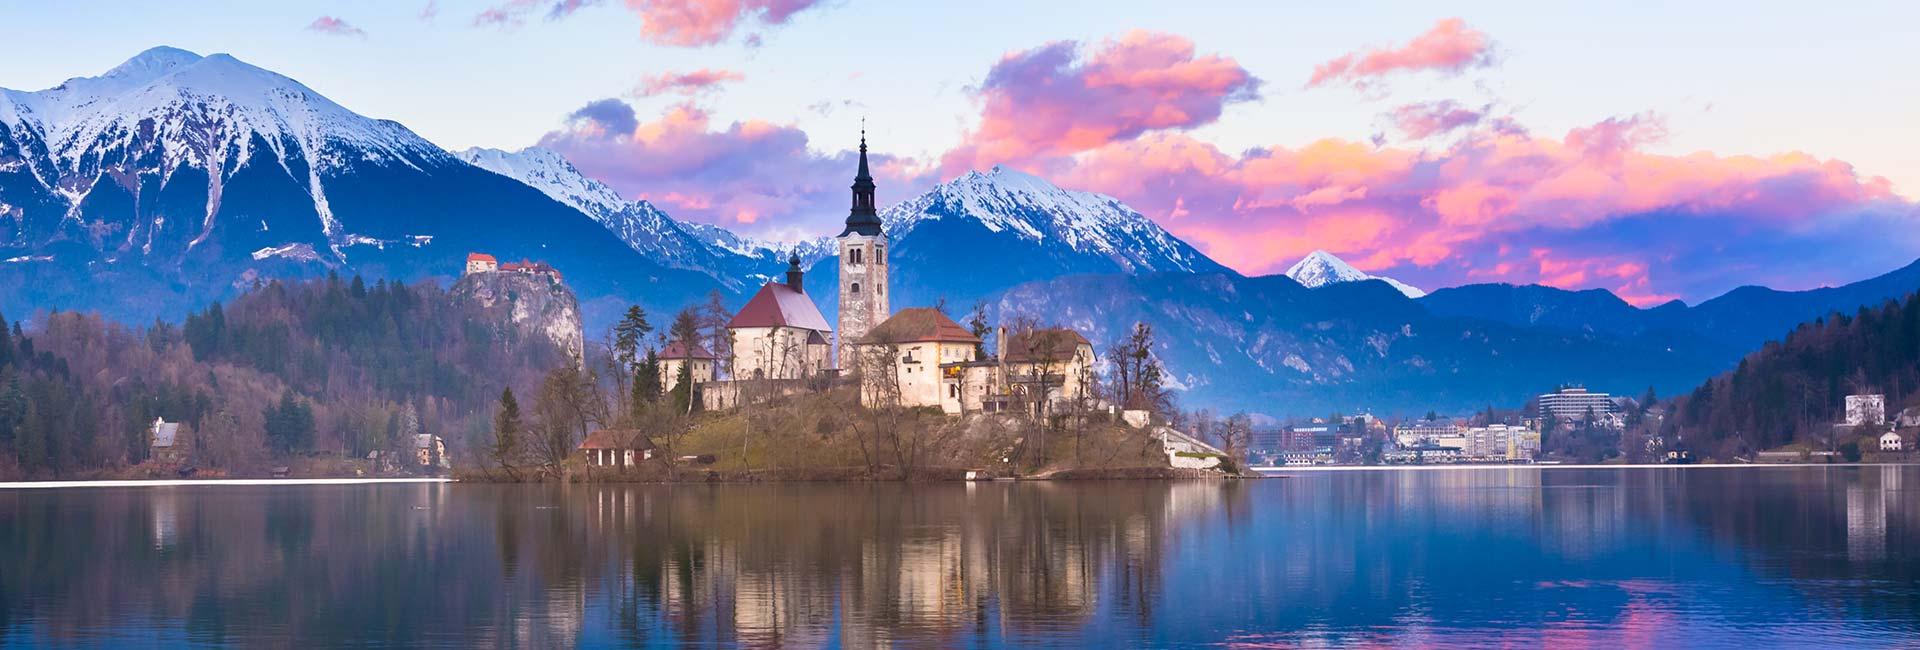 Umzug Slowenien   Schweizer Umzugsfirma   Kehrli + Oeler AG